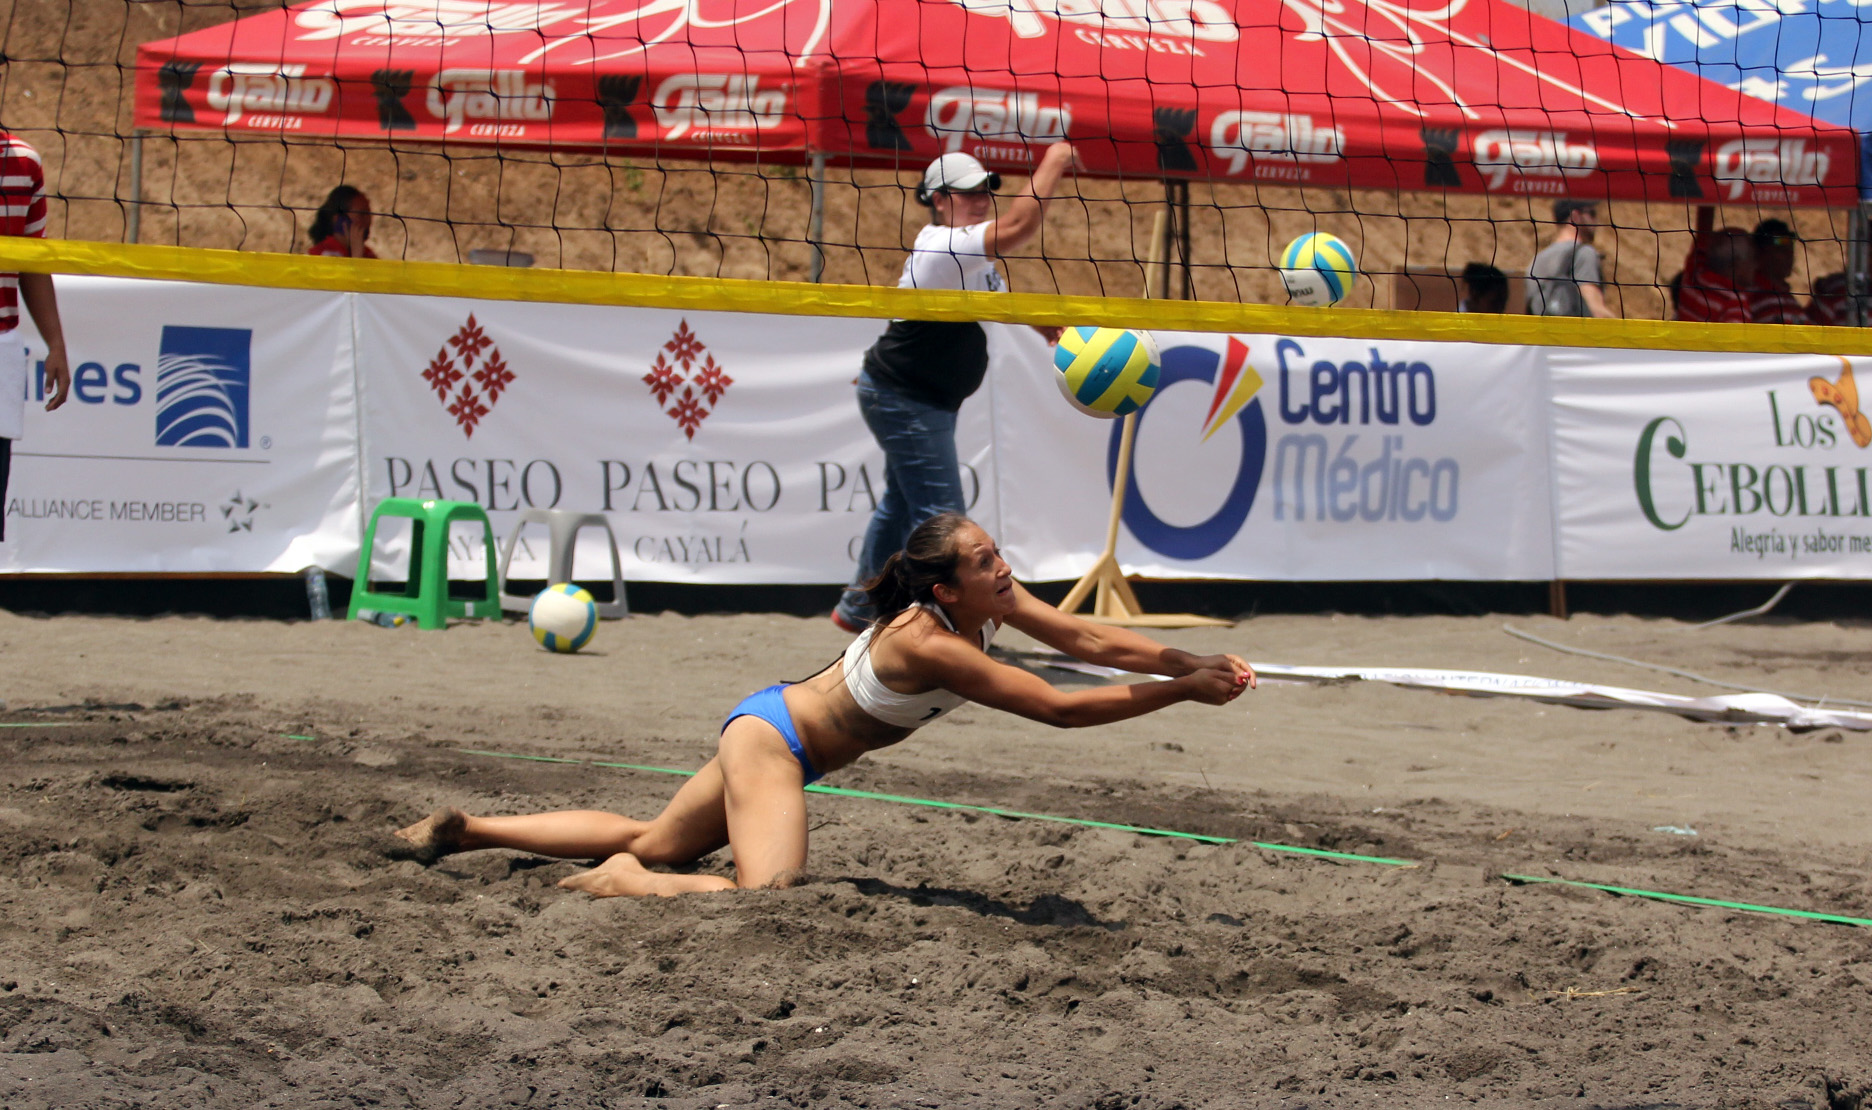 jornada-1-tour-norceca-guatemala-2016_25408661300_o